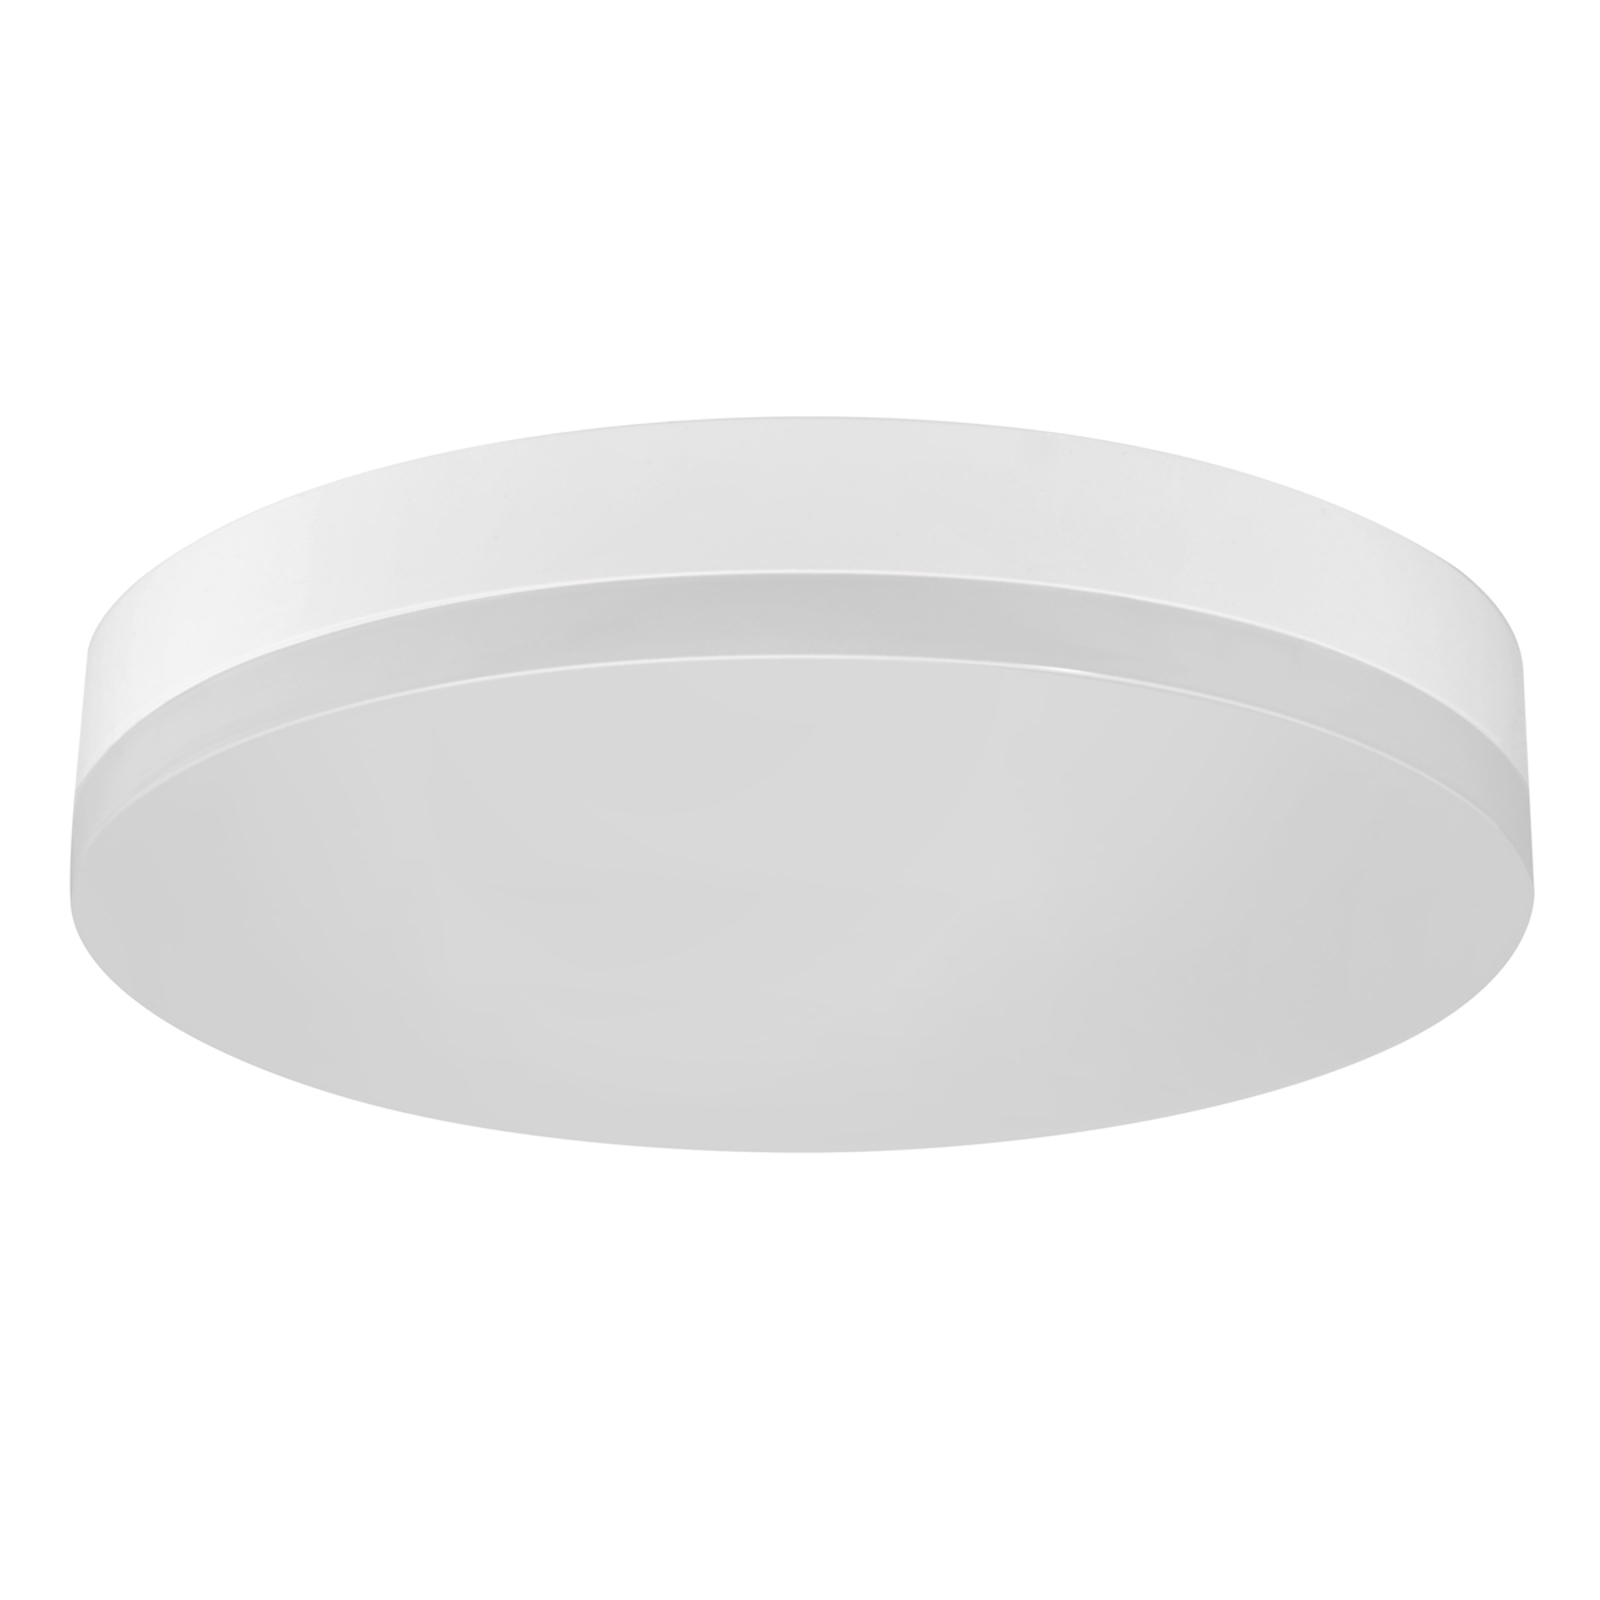 Office Round - LED plafondlamp IP44, warm wit